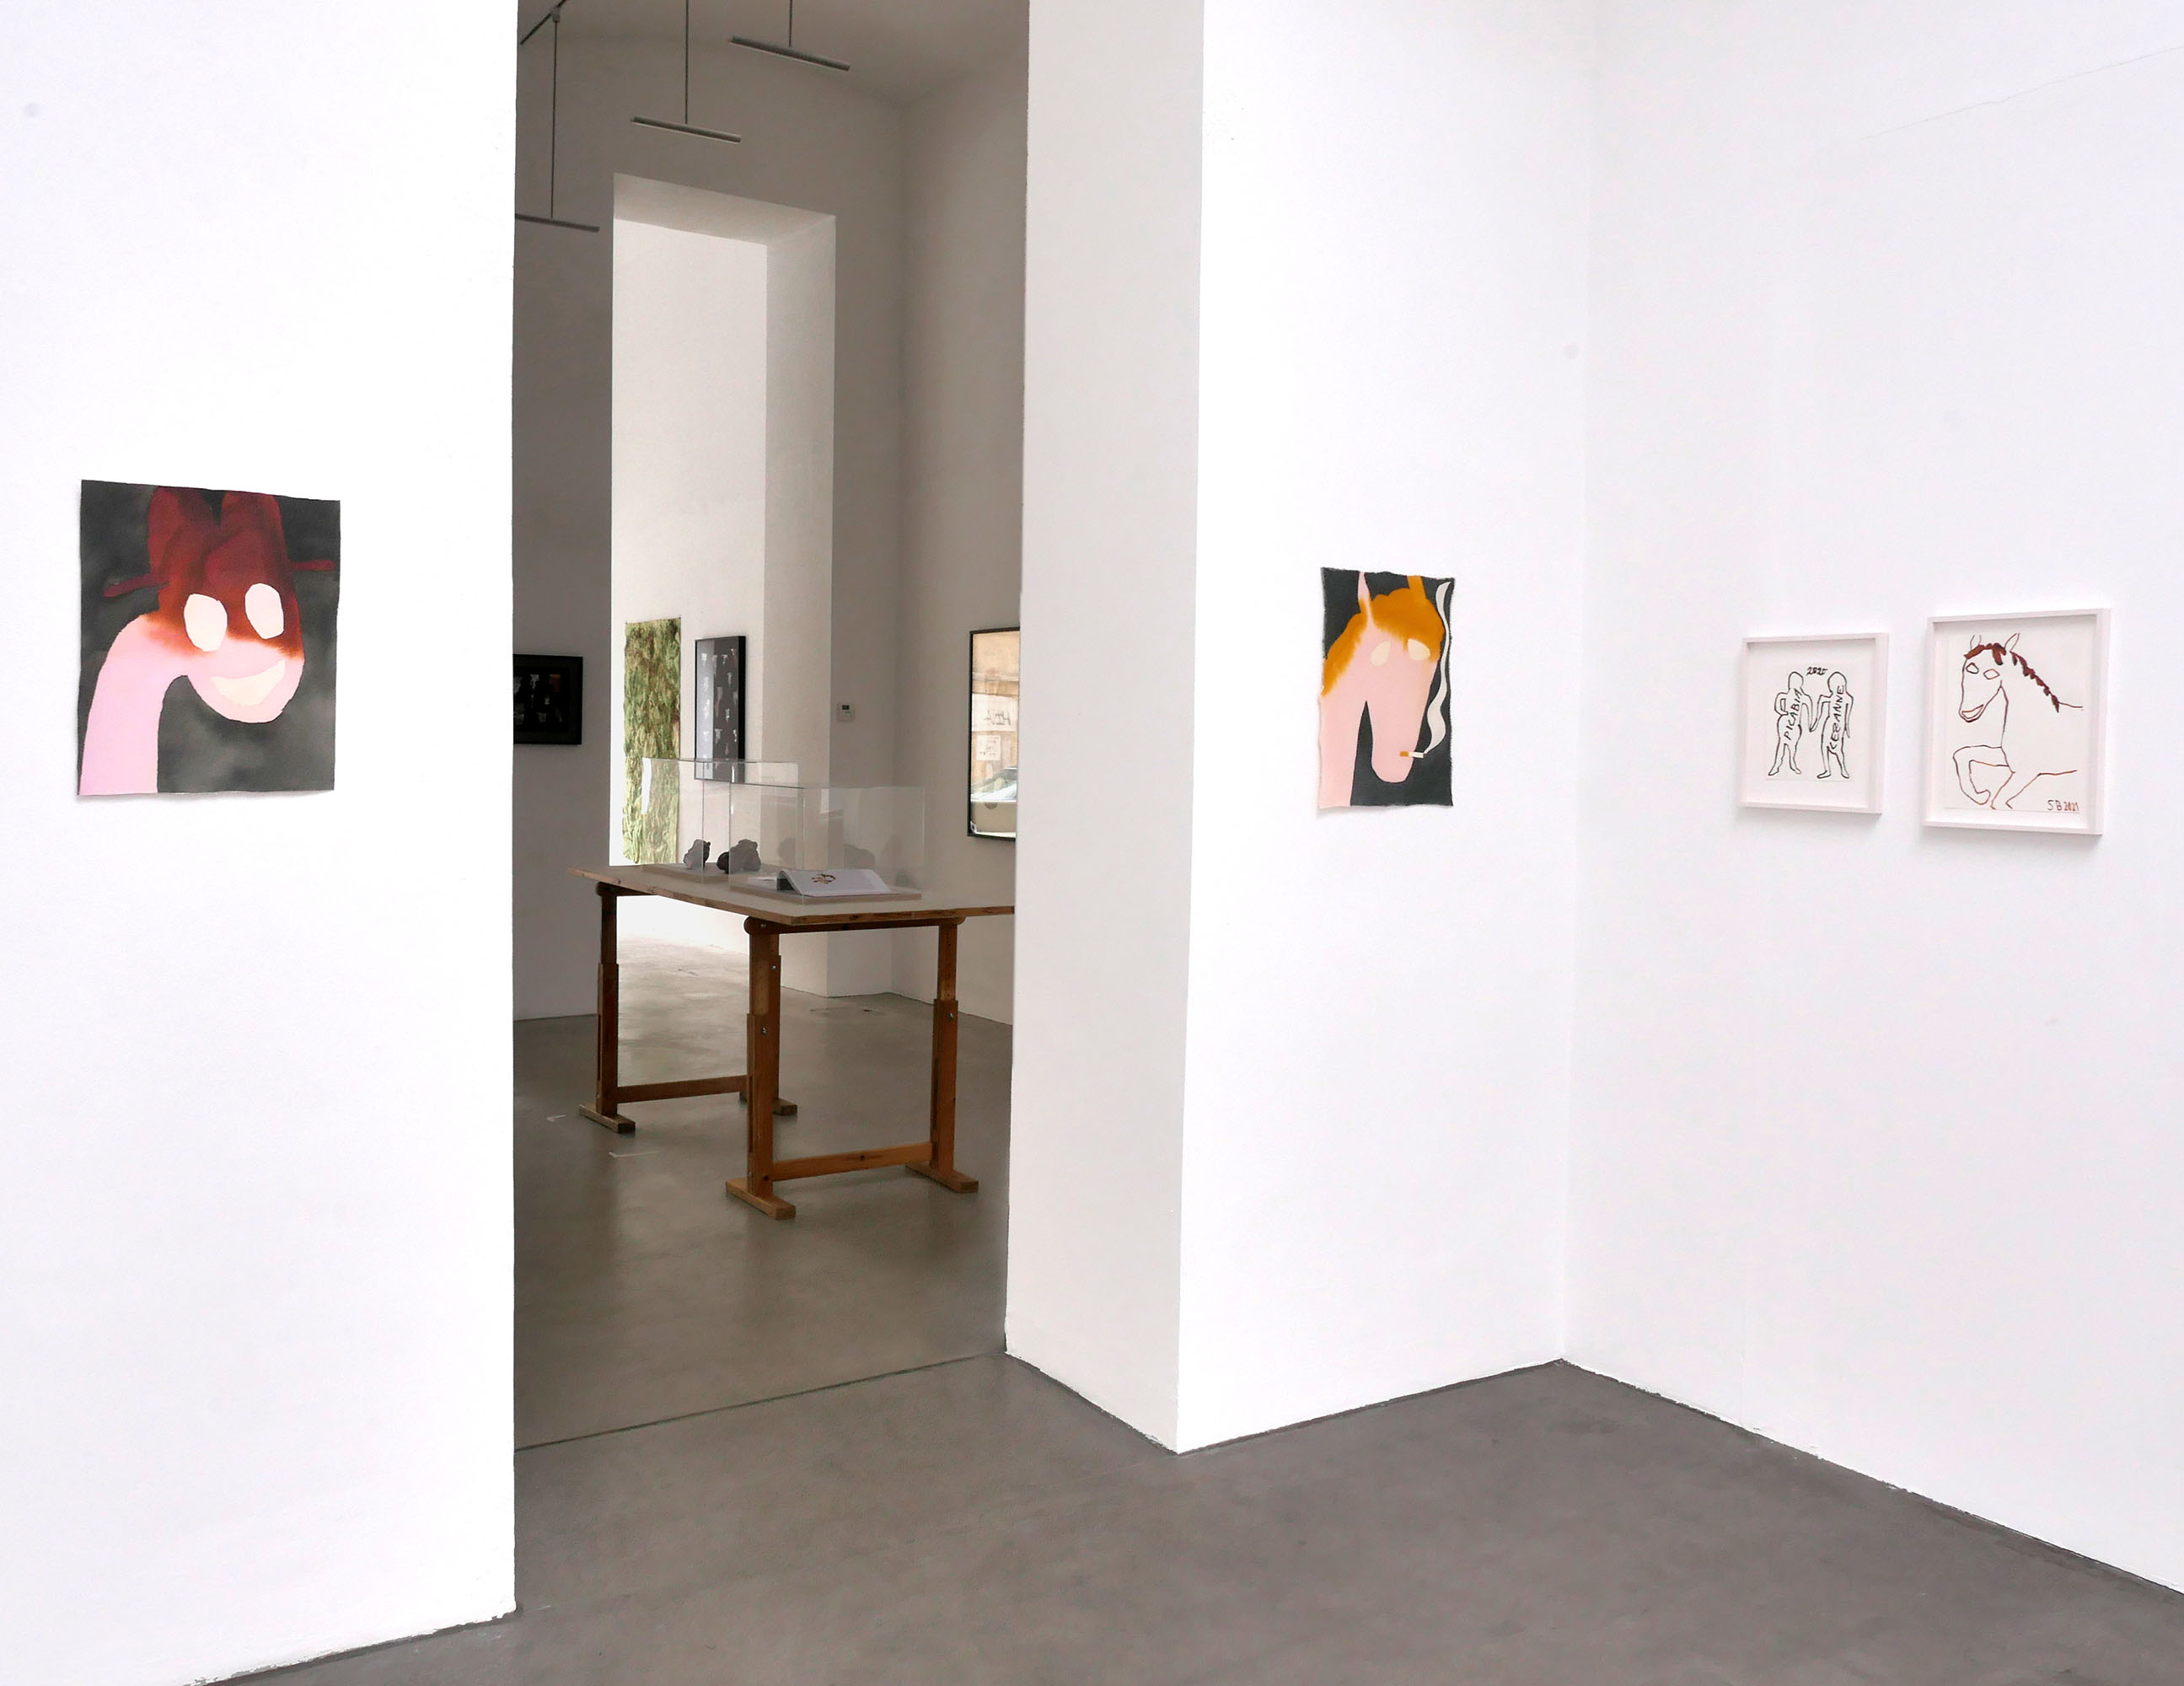 raum mit licht, contemporary art, drawing, pink horses, smoking,